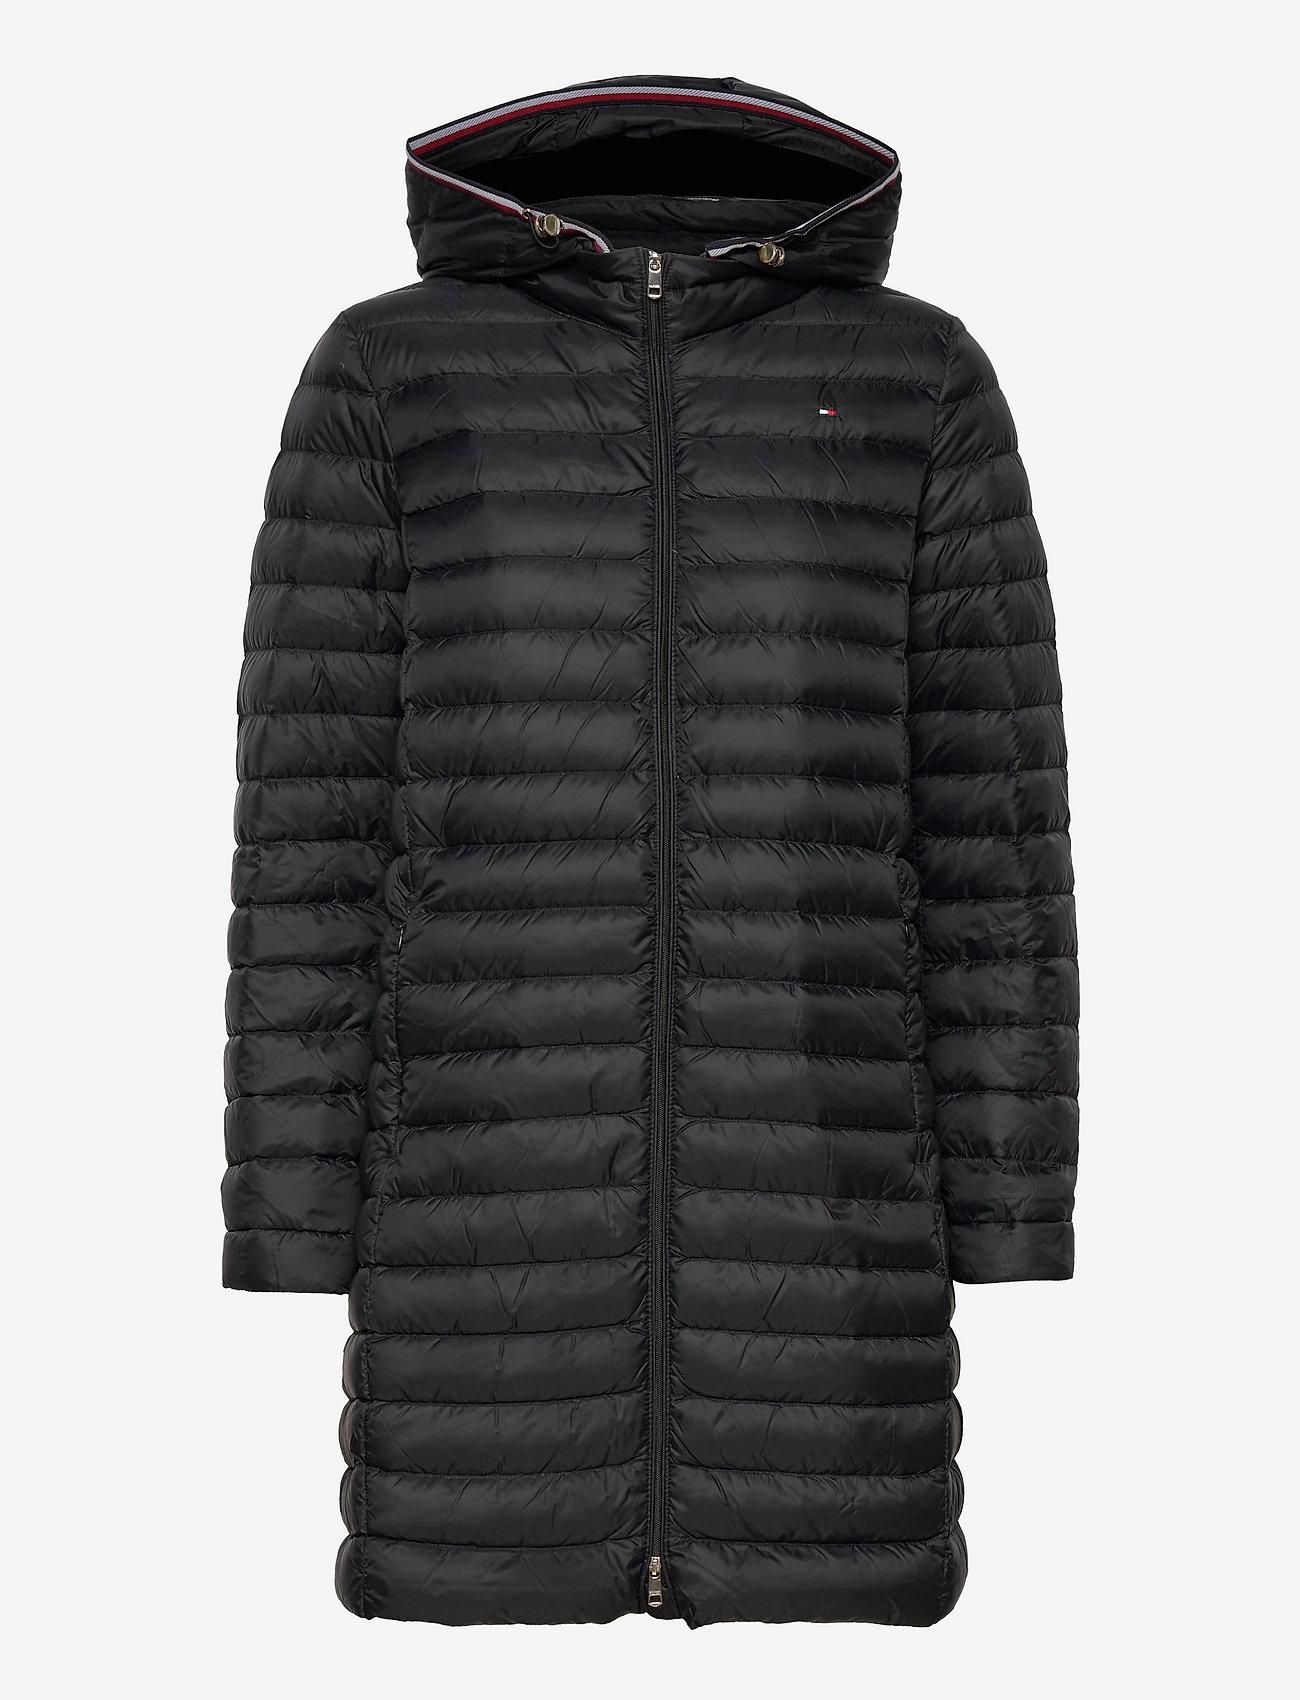 Tommy Hilfiger - TH ESS LW DOWN COAT - winter coats - black - 1